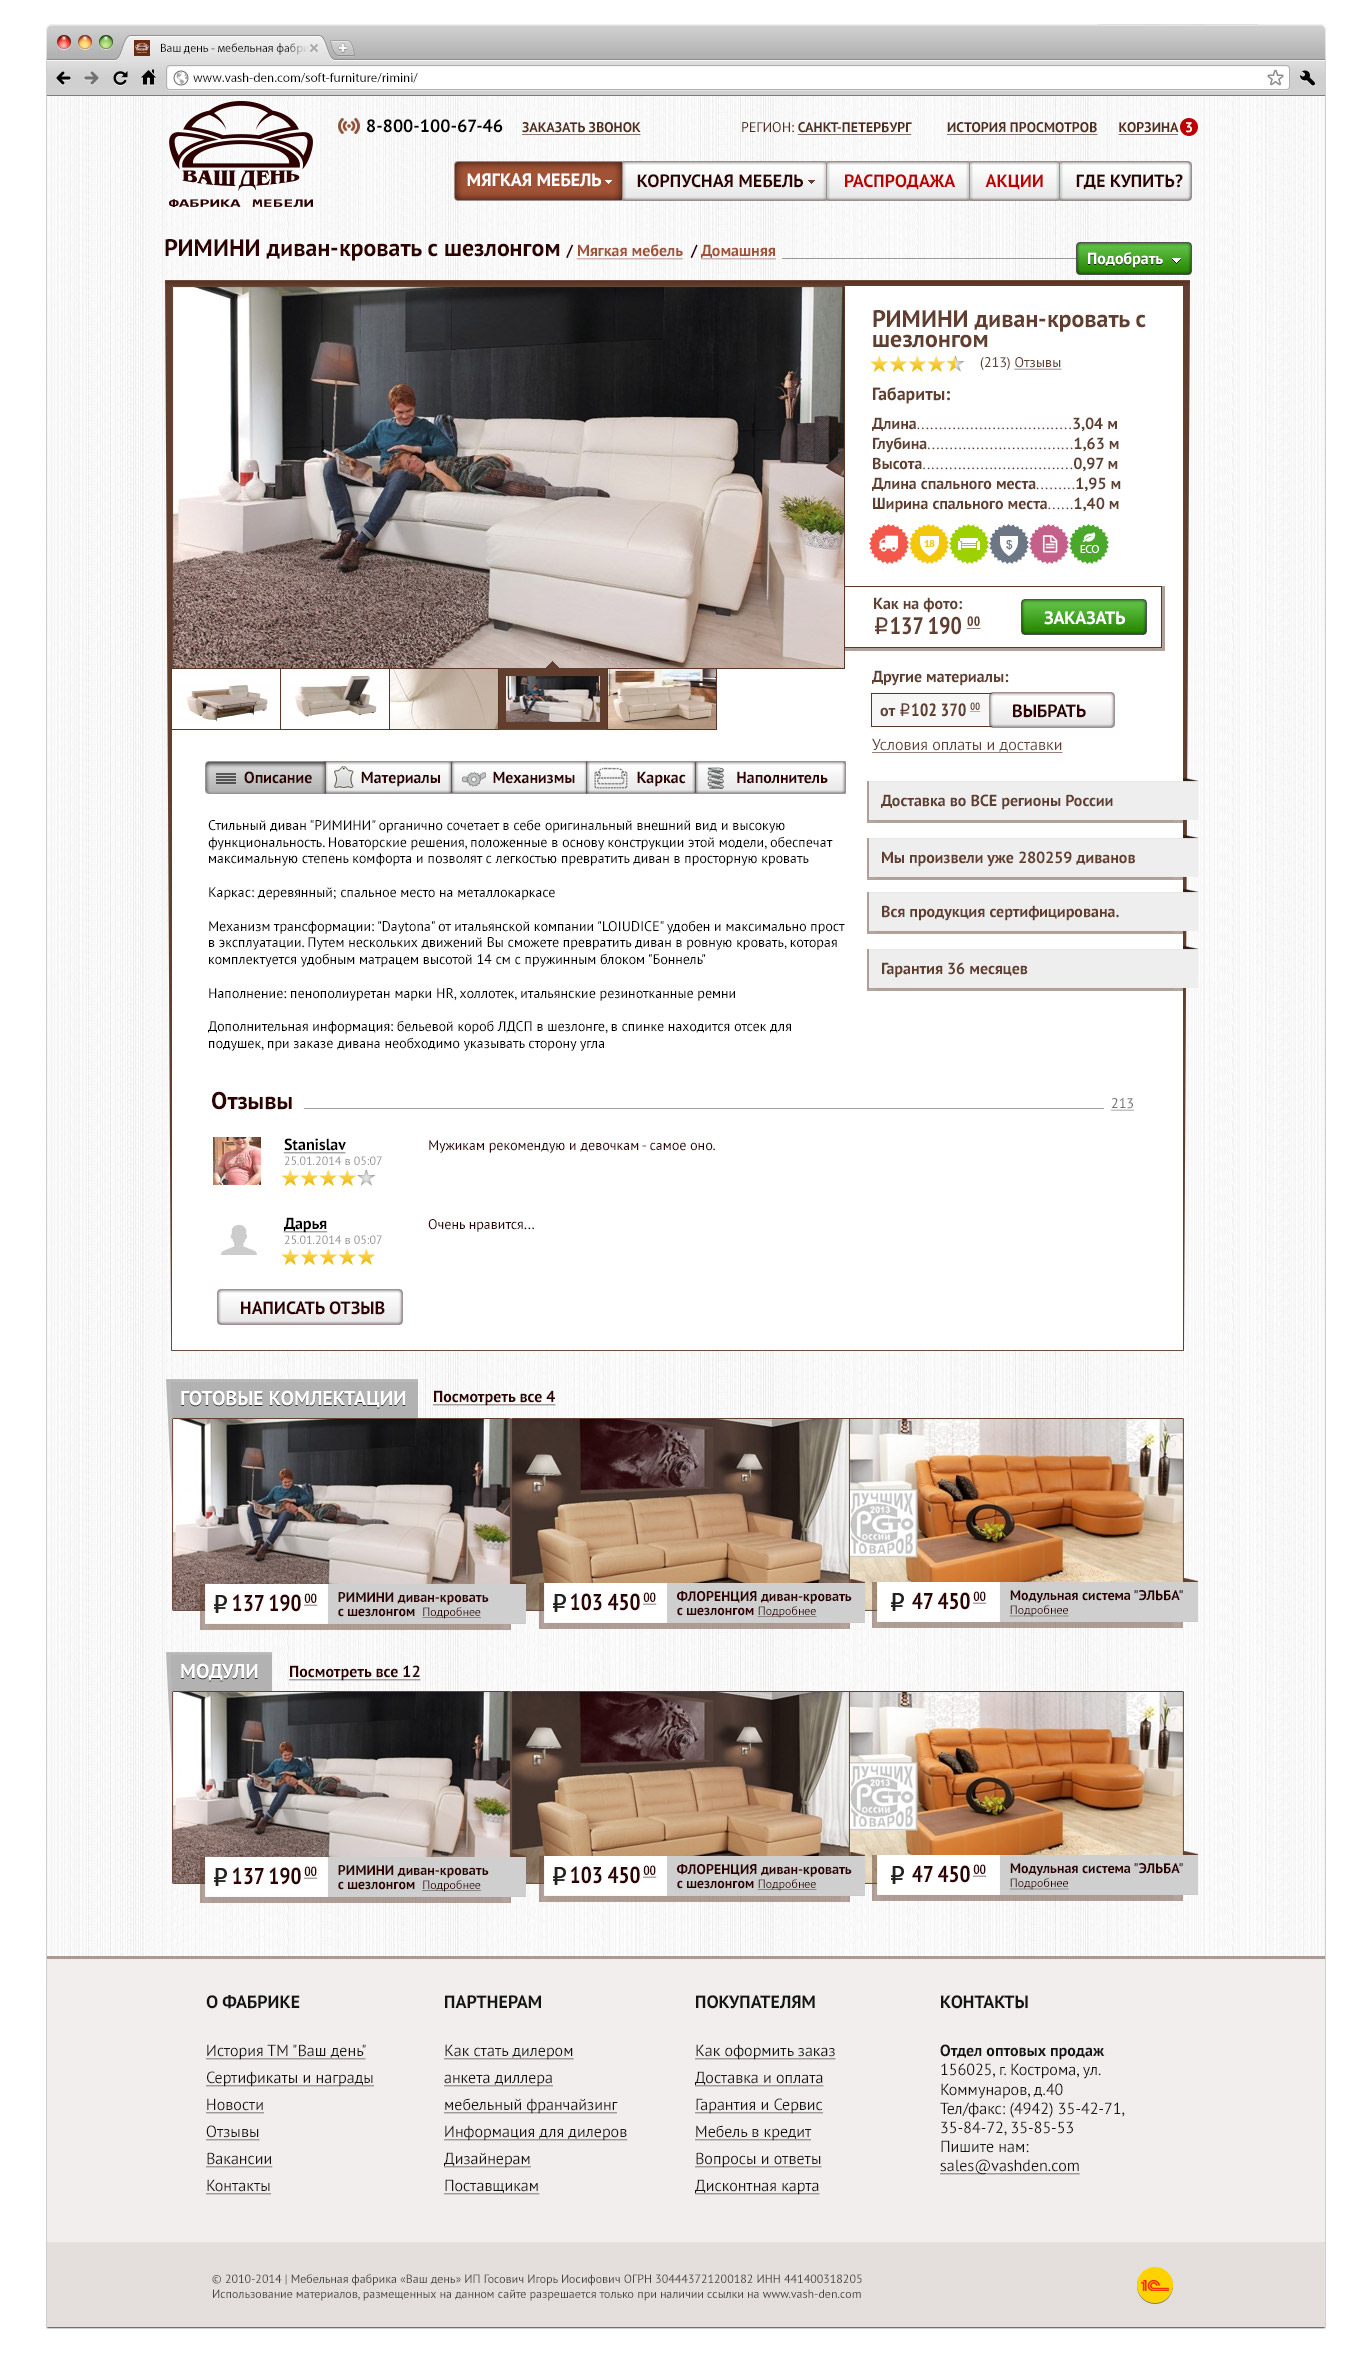 Разработать дизайн для интернет-магазина мебели фото f_09652f363965f96b.jpg